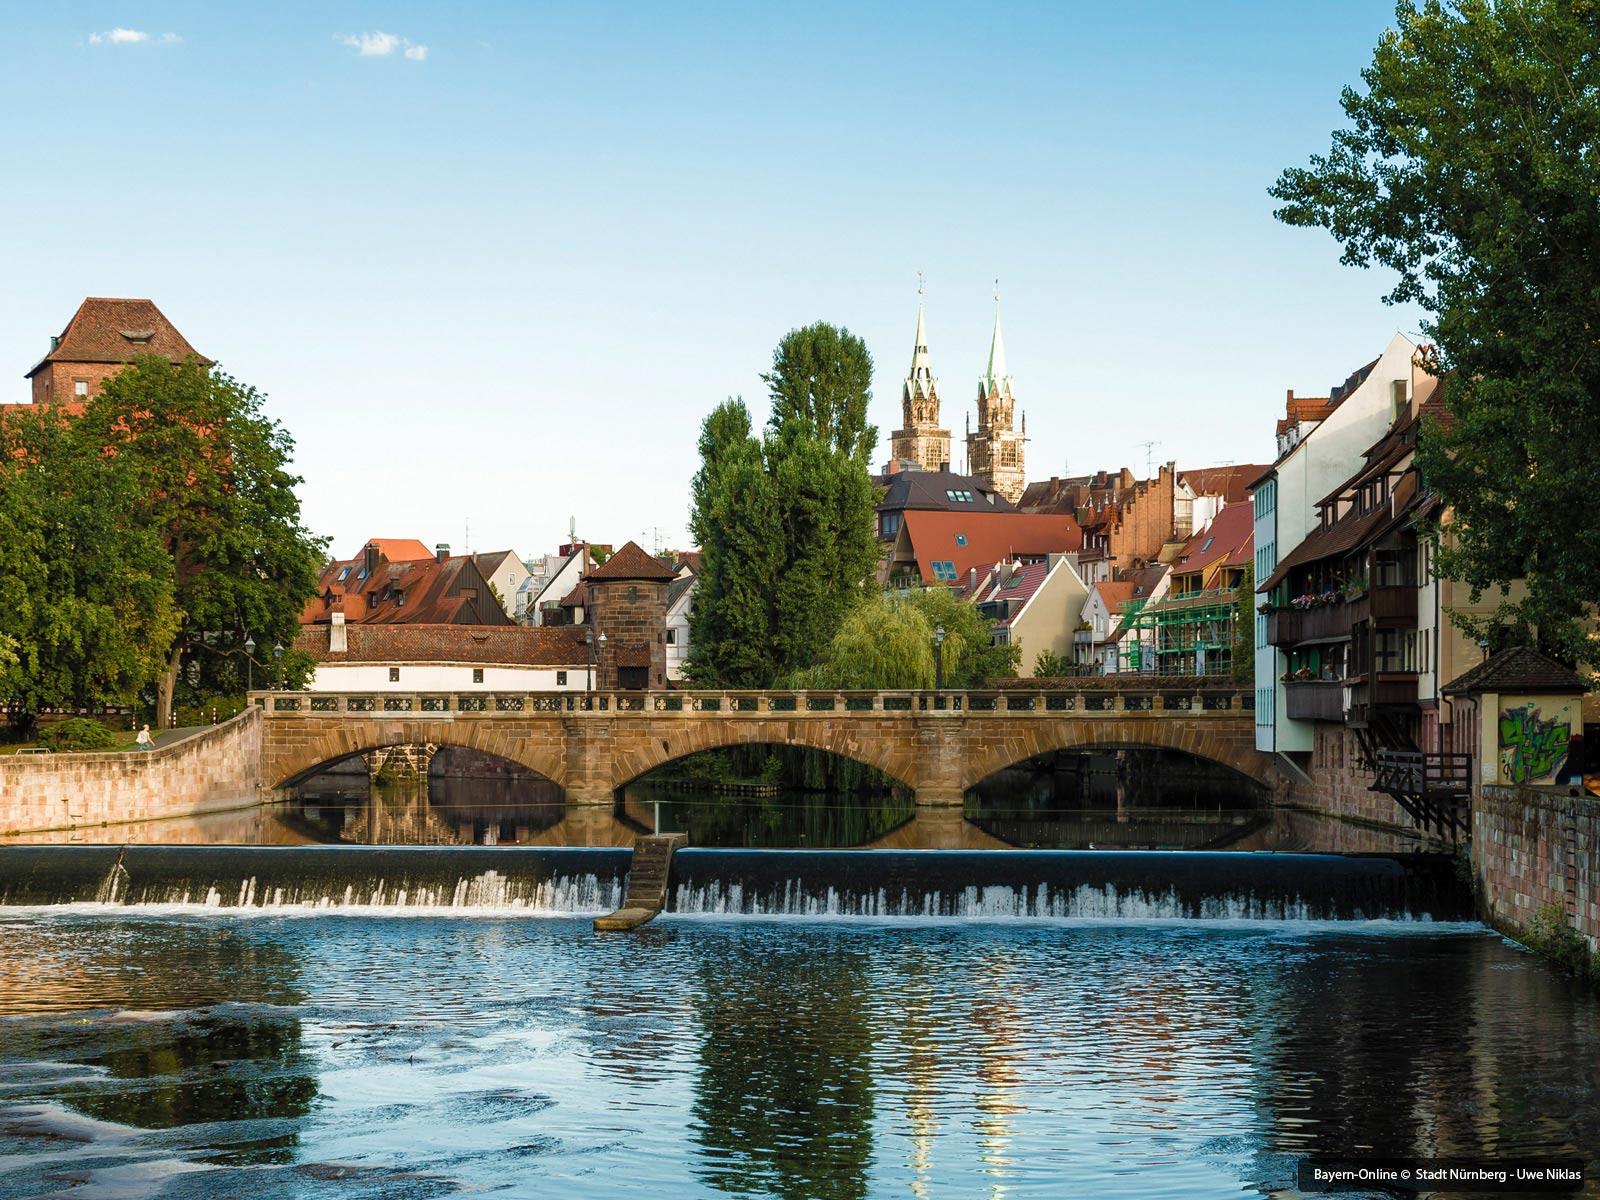 Brücken | Brücken in Nürnberg | Brücken Nürnberg ...